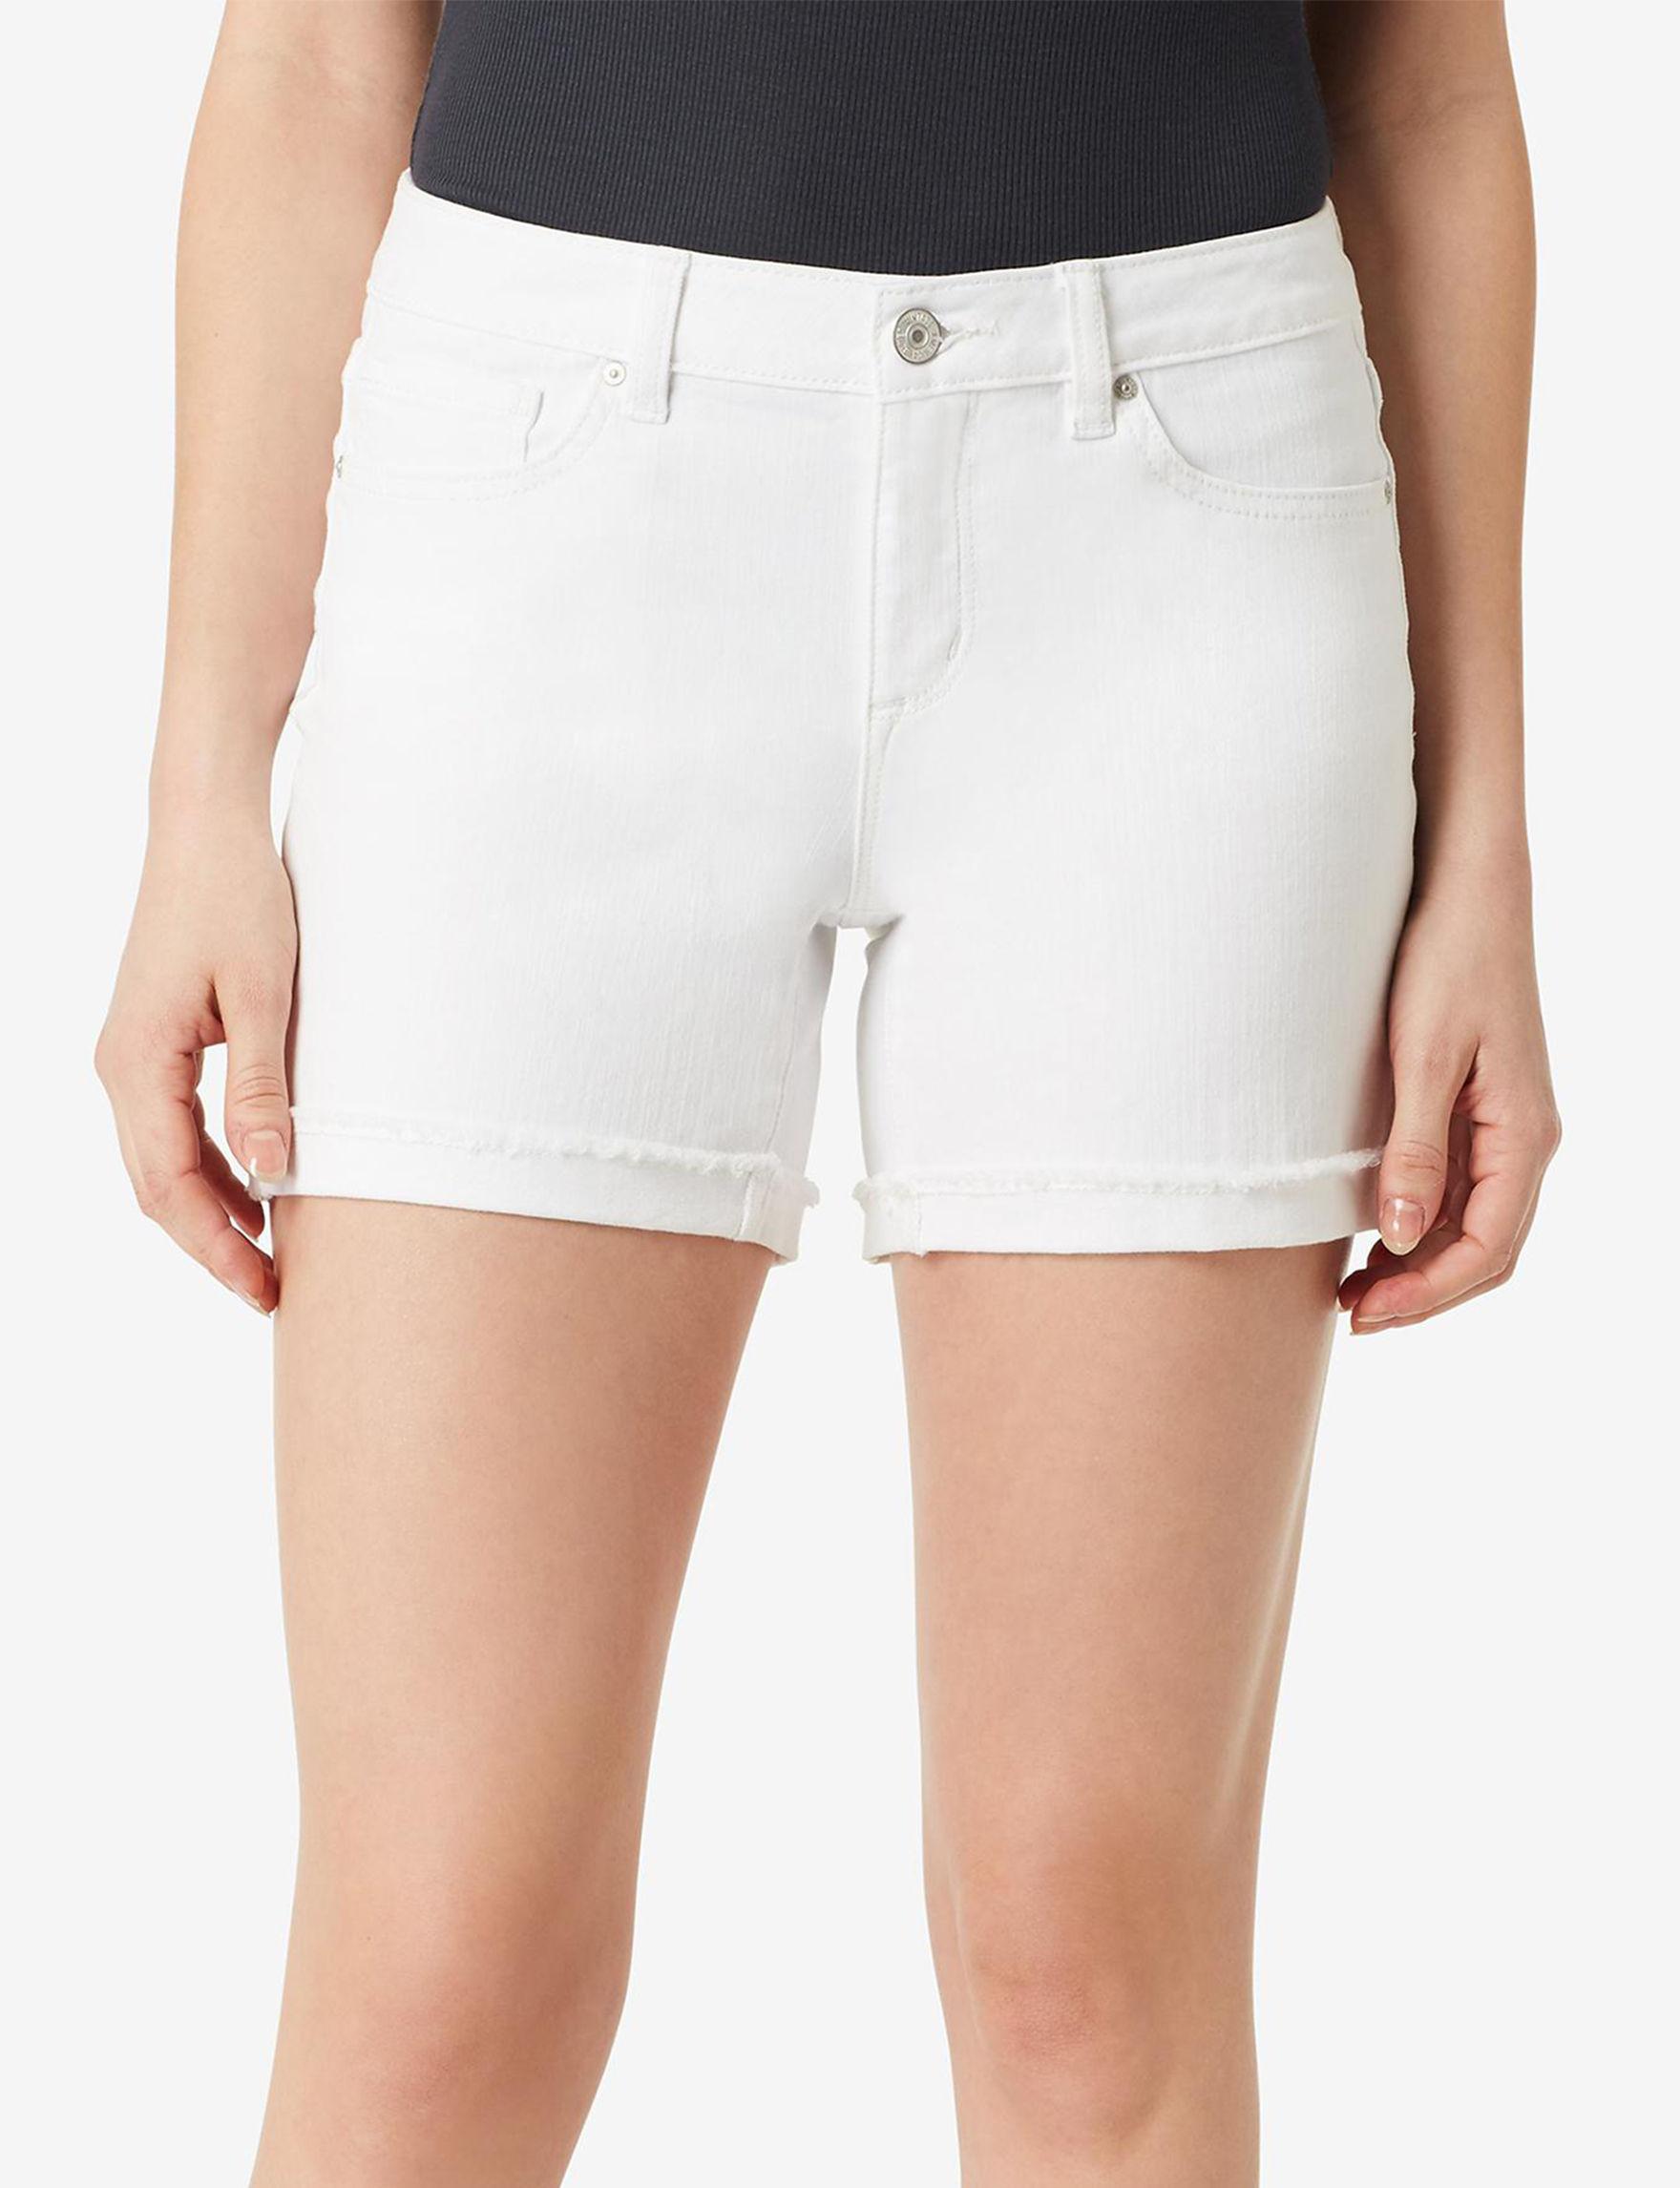 Vintage America Blues White Denim Shorts